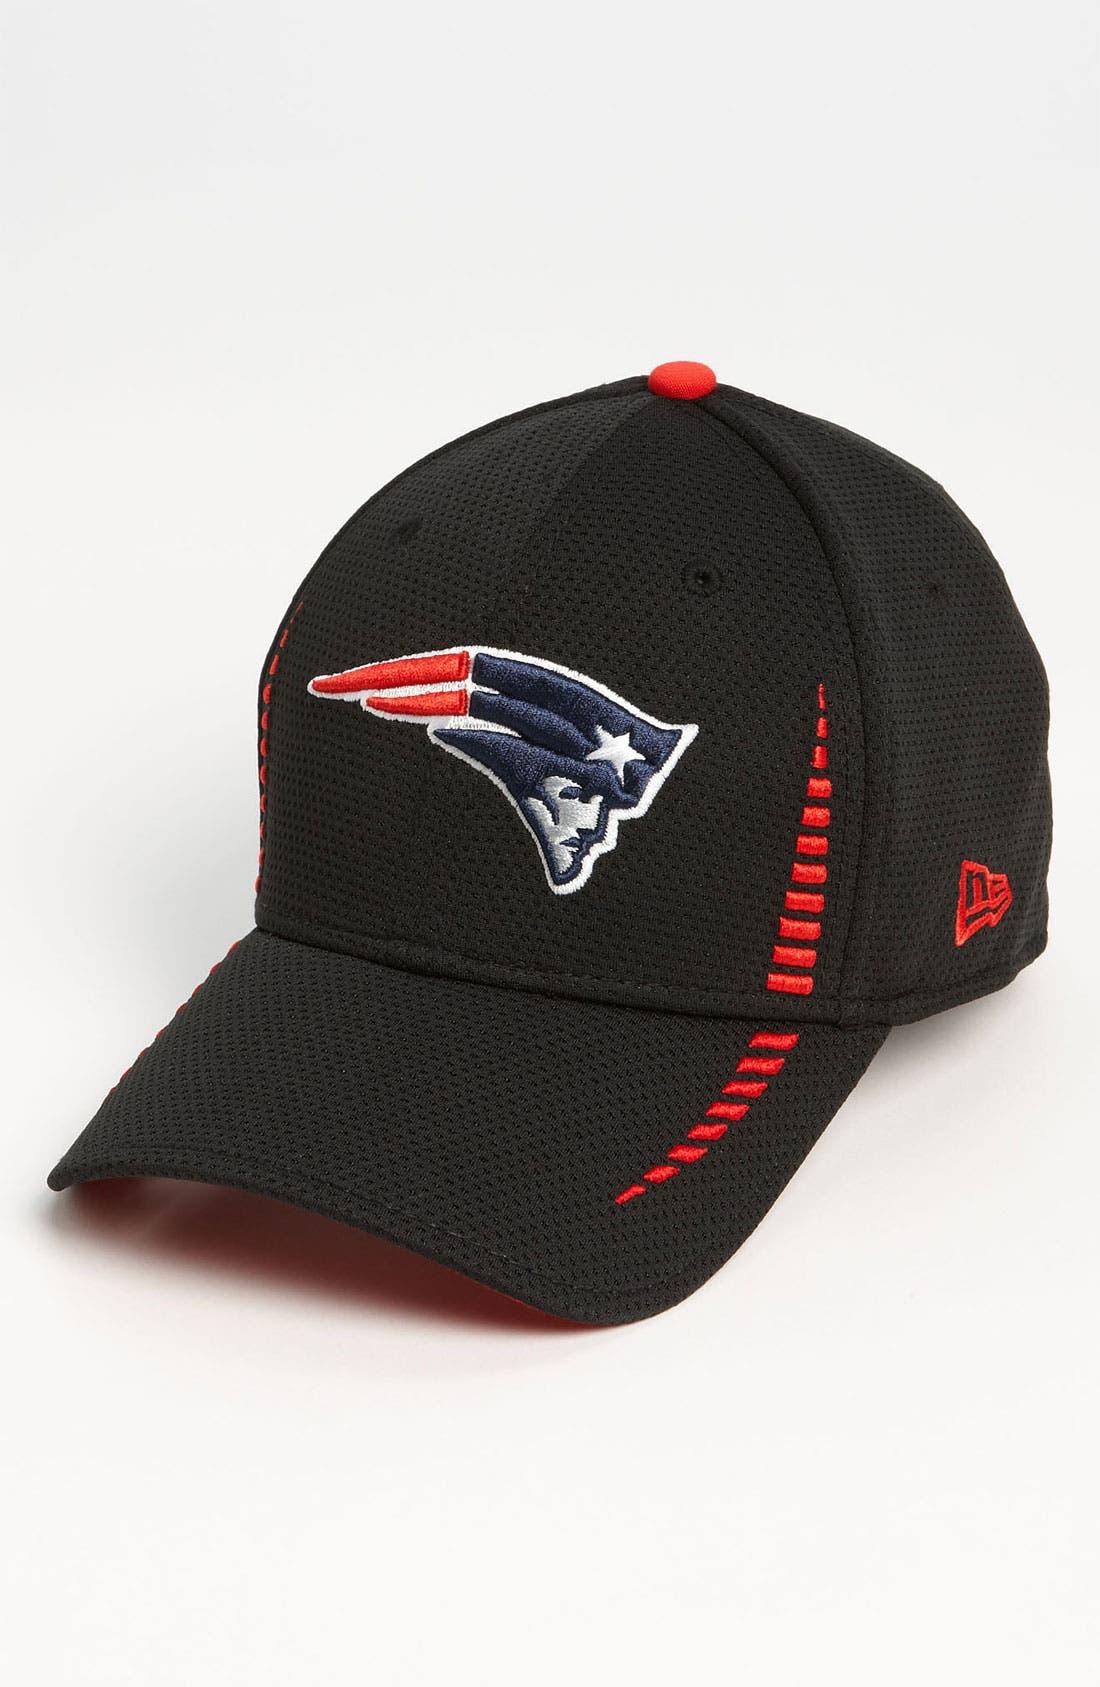 Alternate Image 1 Selected - New Era Cap 'Training Camp - New England Patriots' Baseball Cap